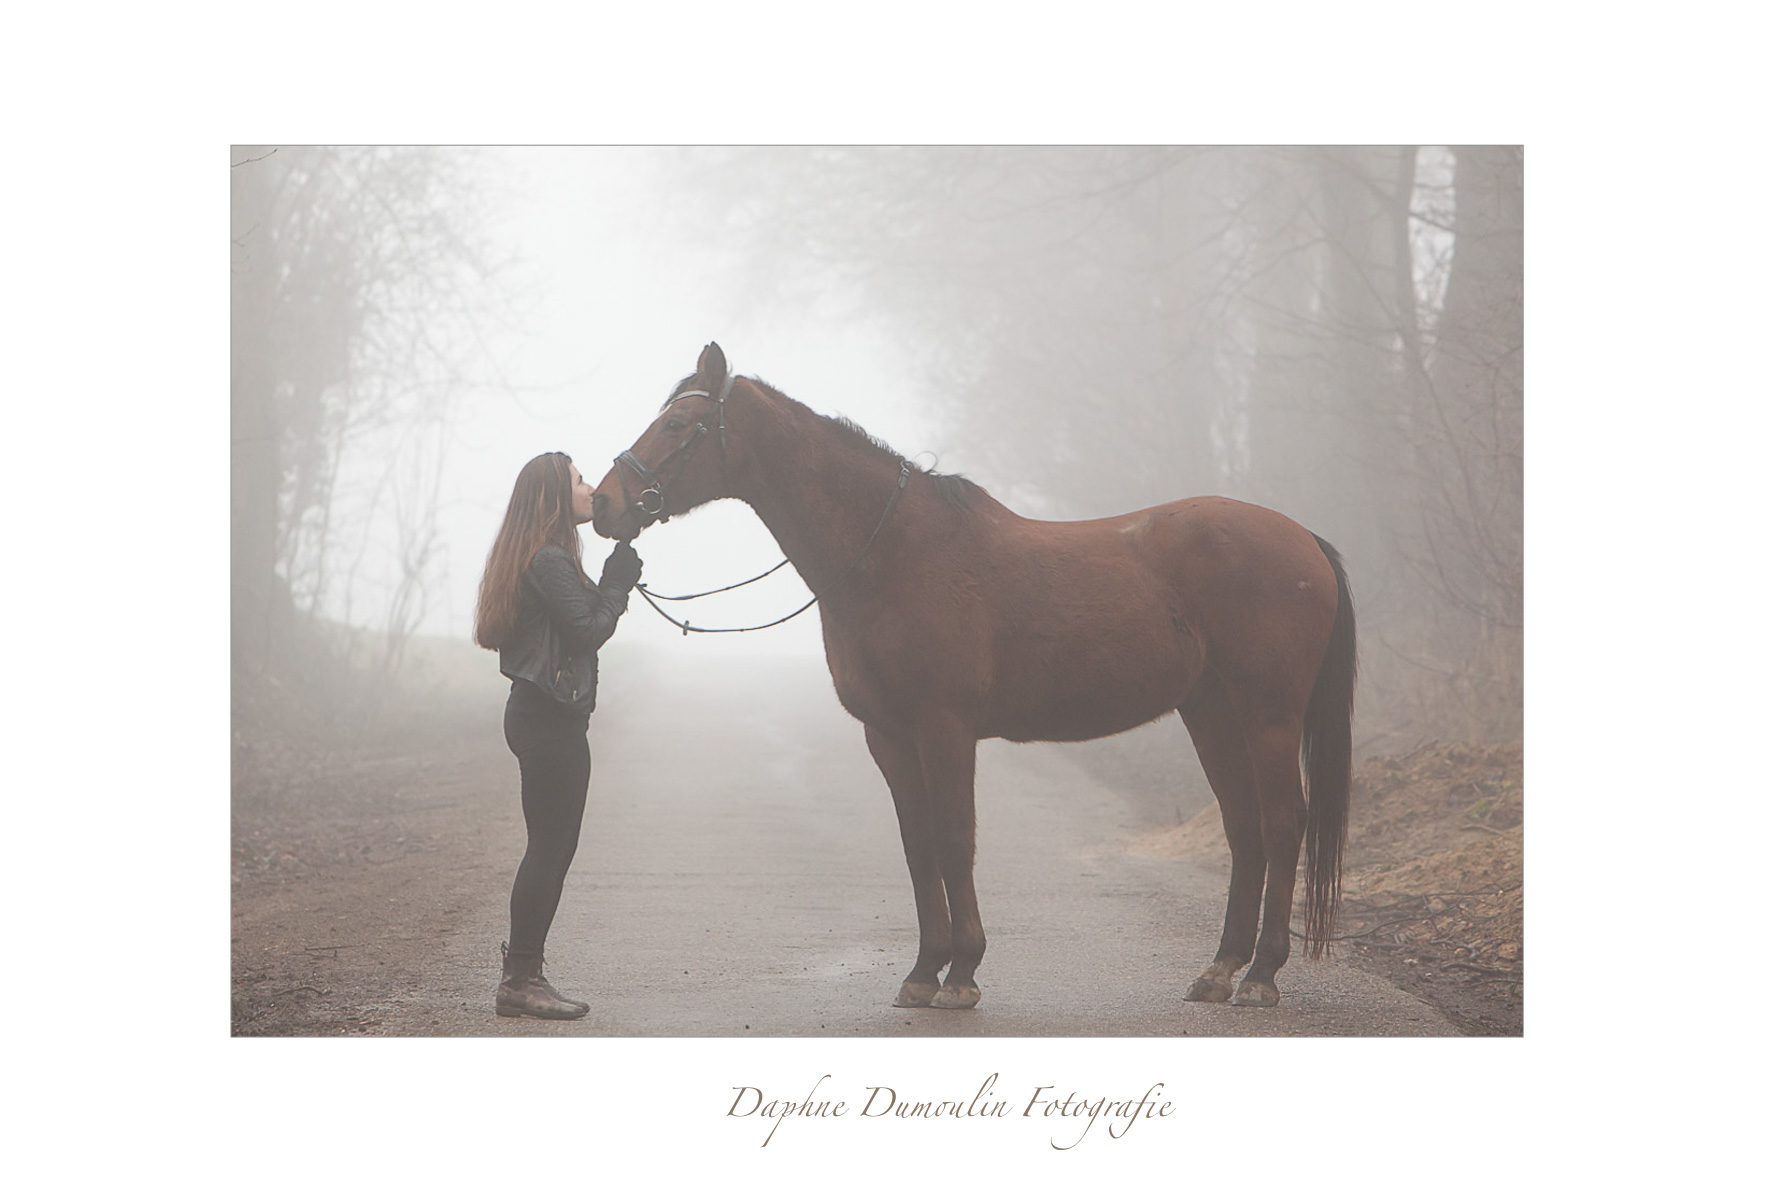 daphnedumoulin_fotograaf